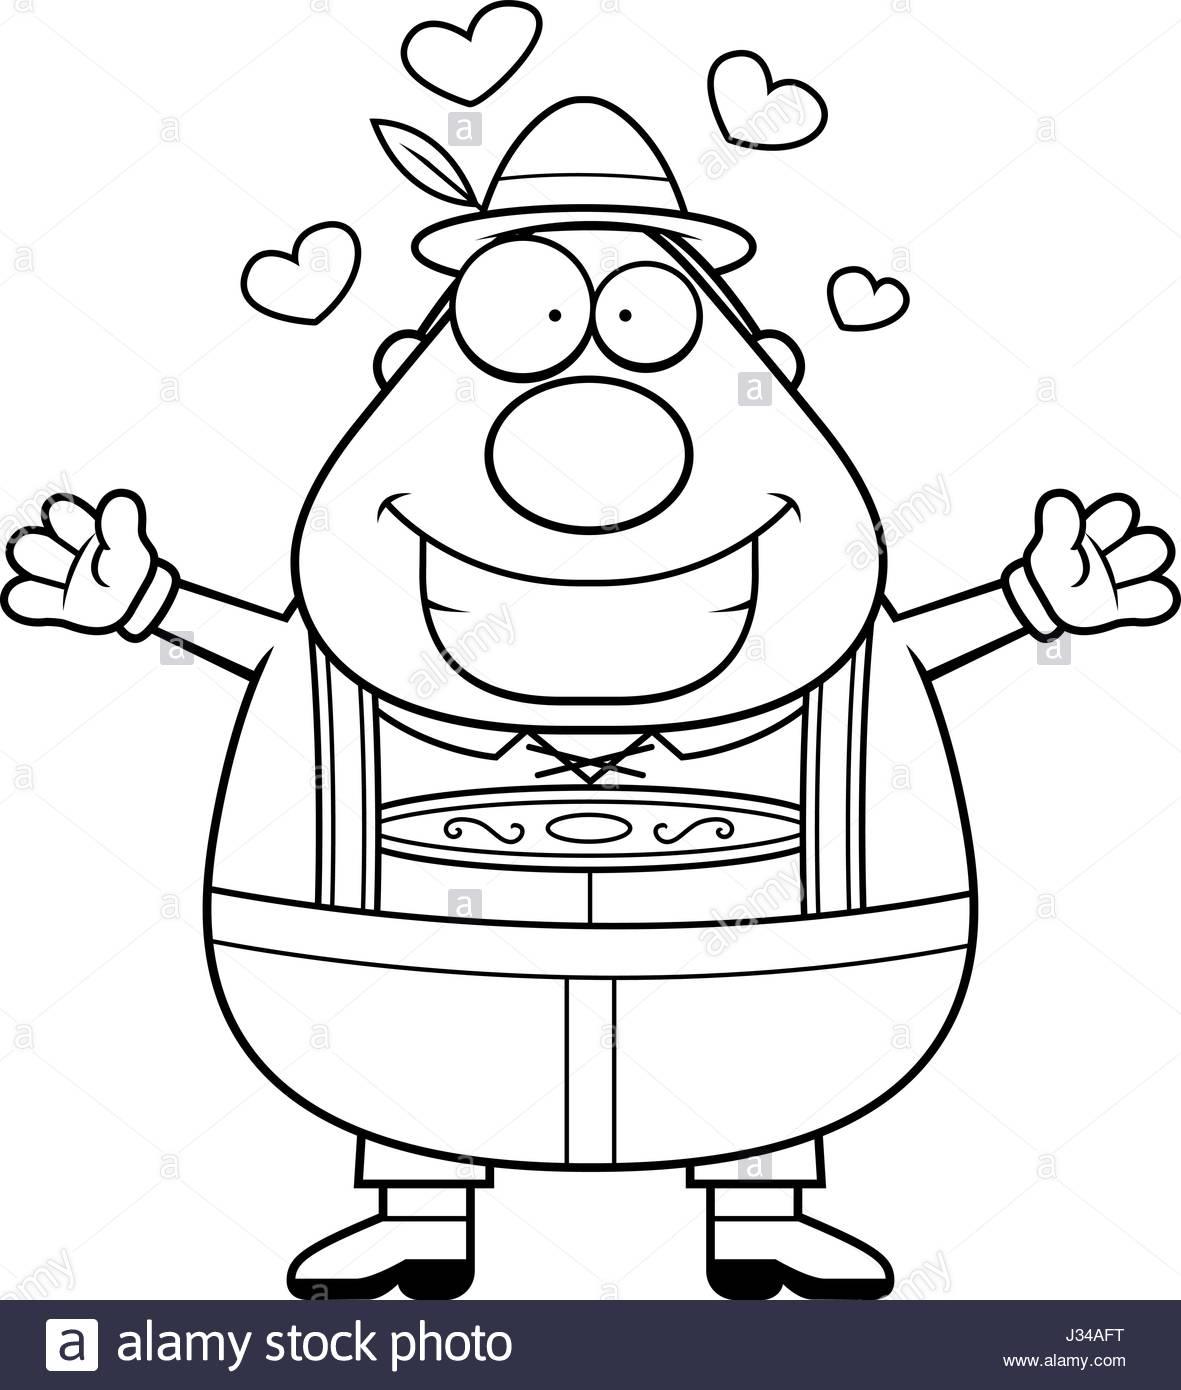 1181x1390 A Cartoon Illustration Of A German Man In Lederhosen Ready To Give